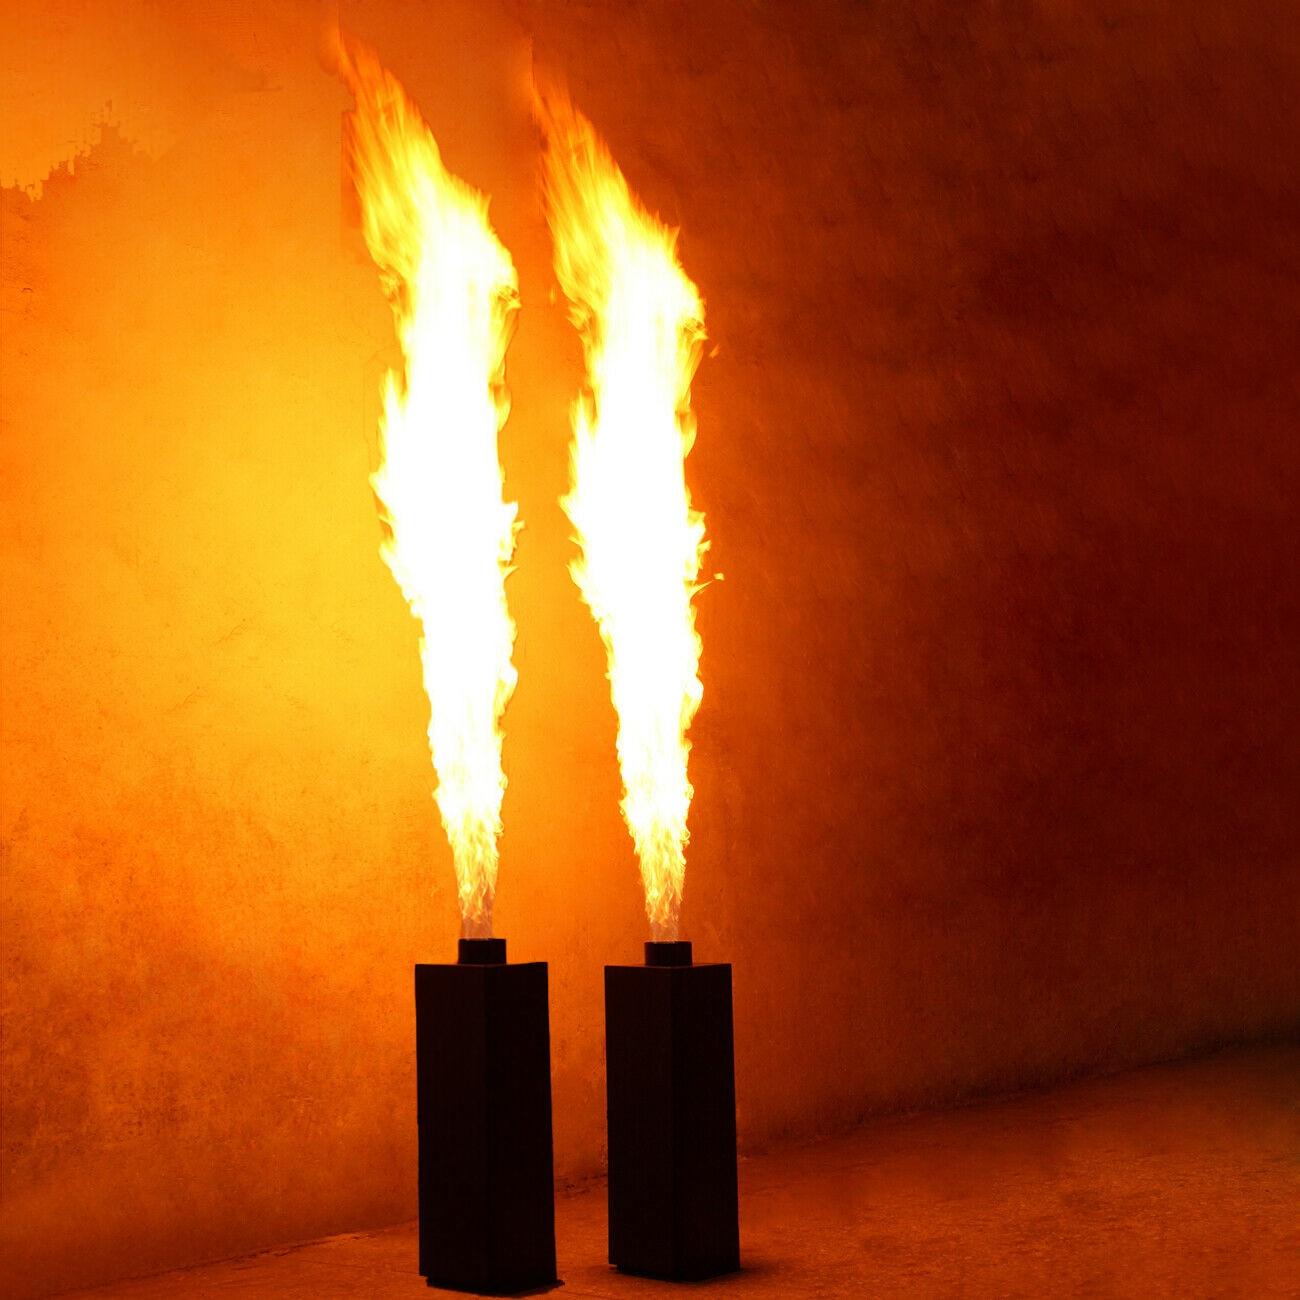 Honhill 2x200W Flamme Spritzen Projektor Bühne Projektor Feuer Wirkung DMX512 Aerosol Flamme DJ Bühne Projektor Maschine Party